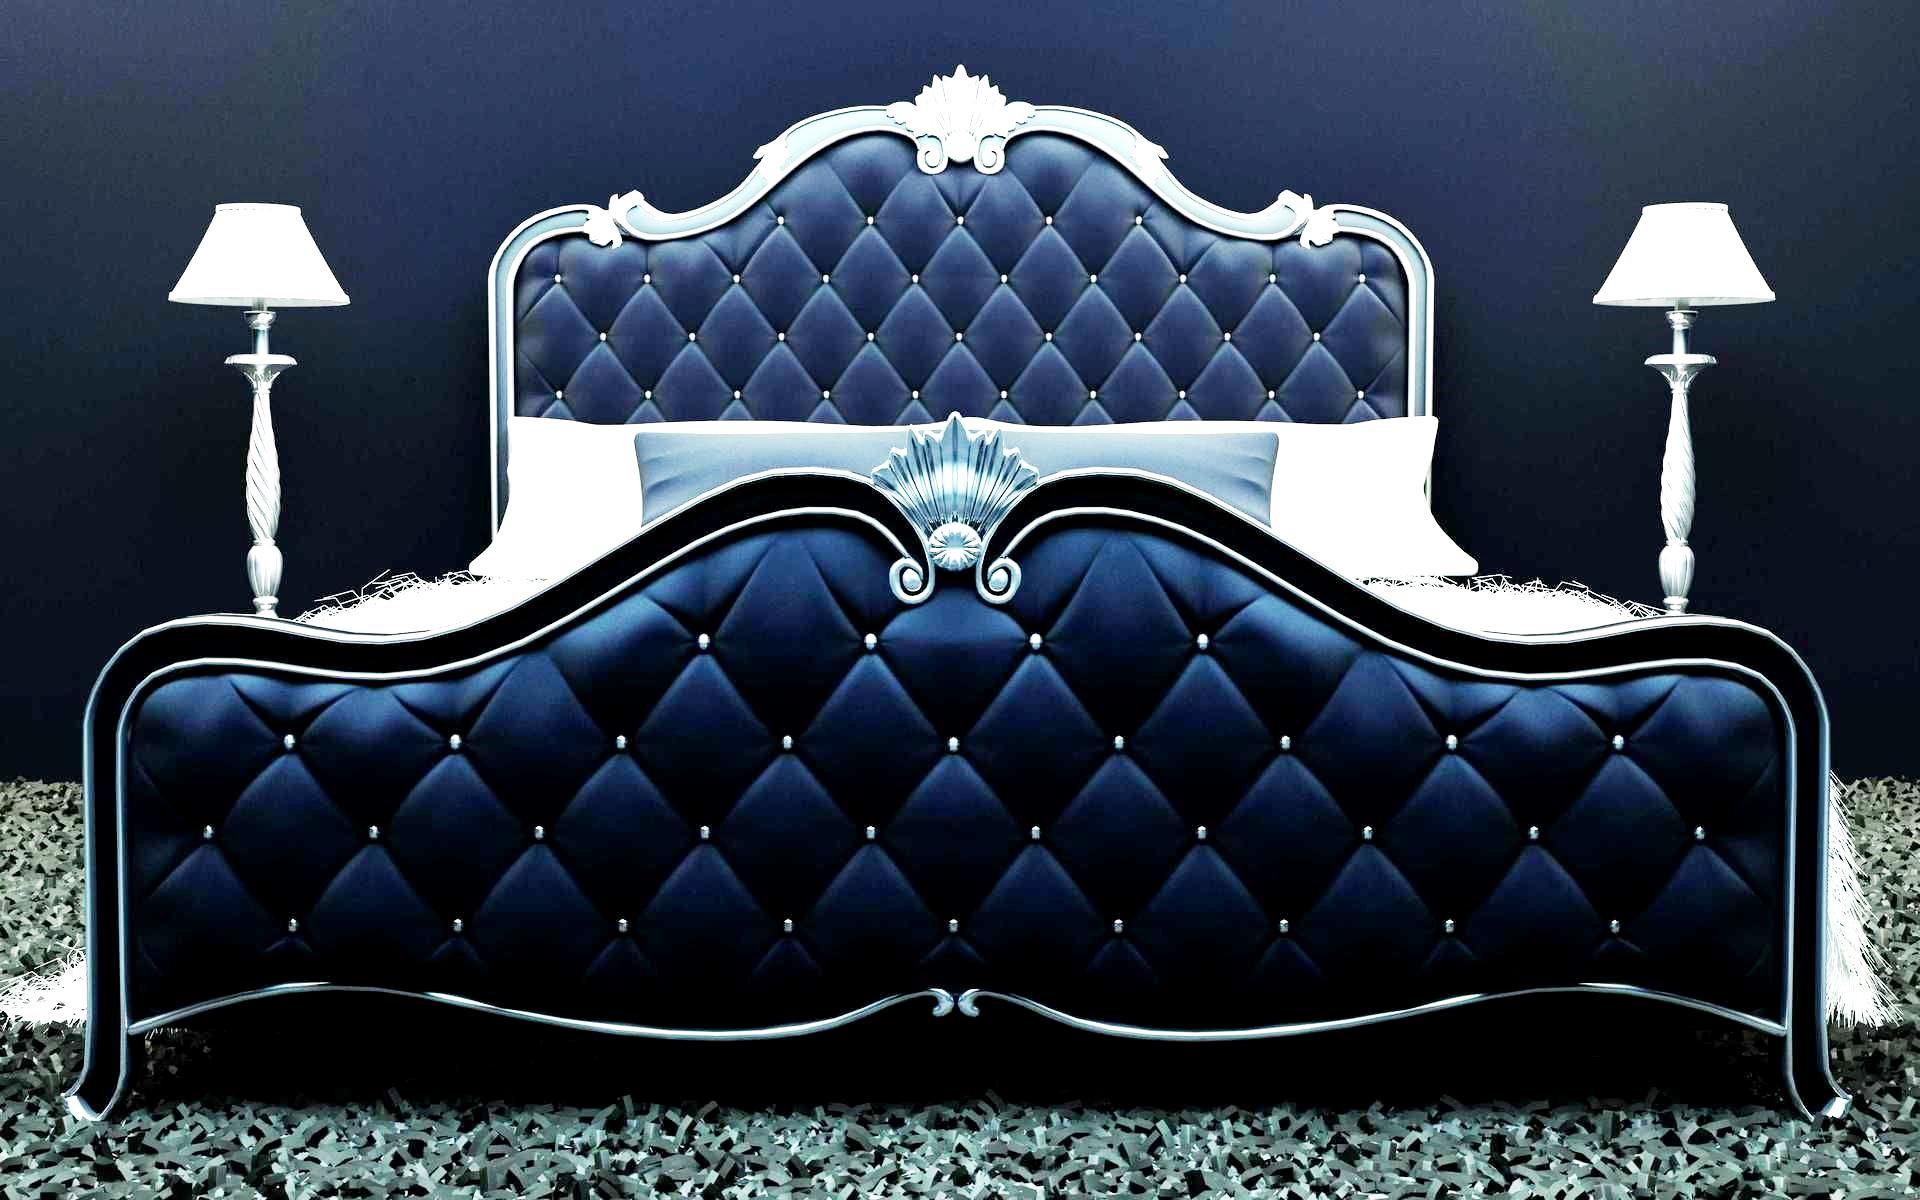 krovat_italya_miagkaya_mebel_kozha_spalnia_tkan_derevo_interier_design_classic_loft_modern_kabinet_g